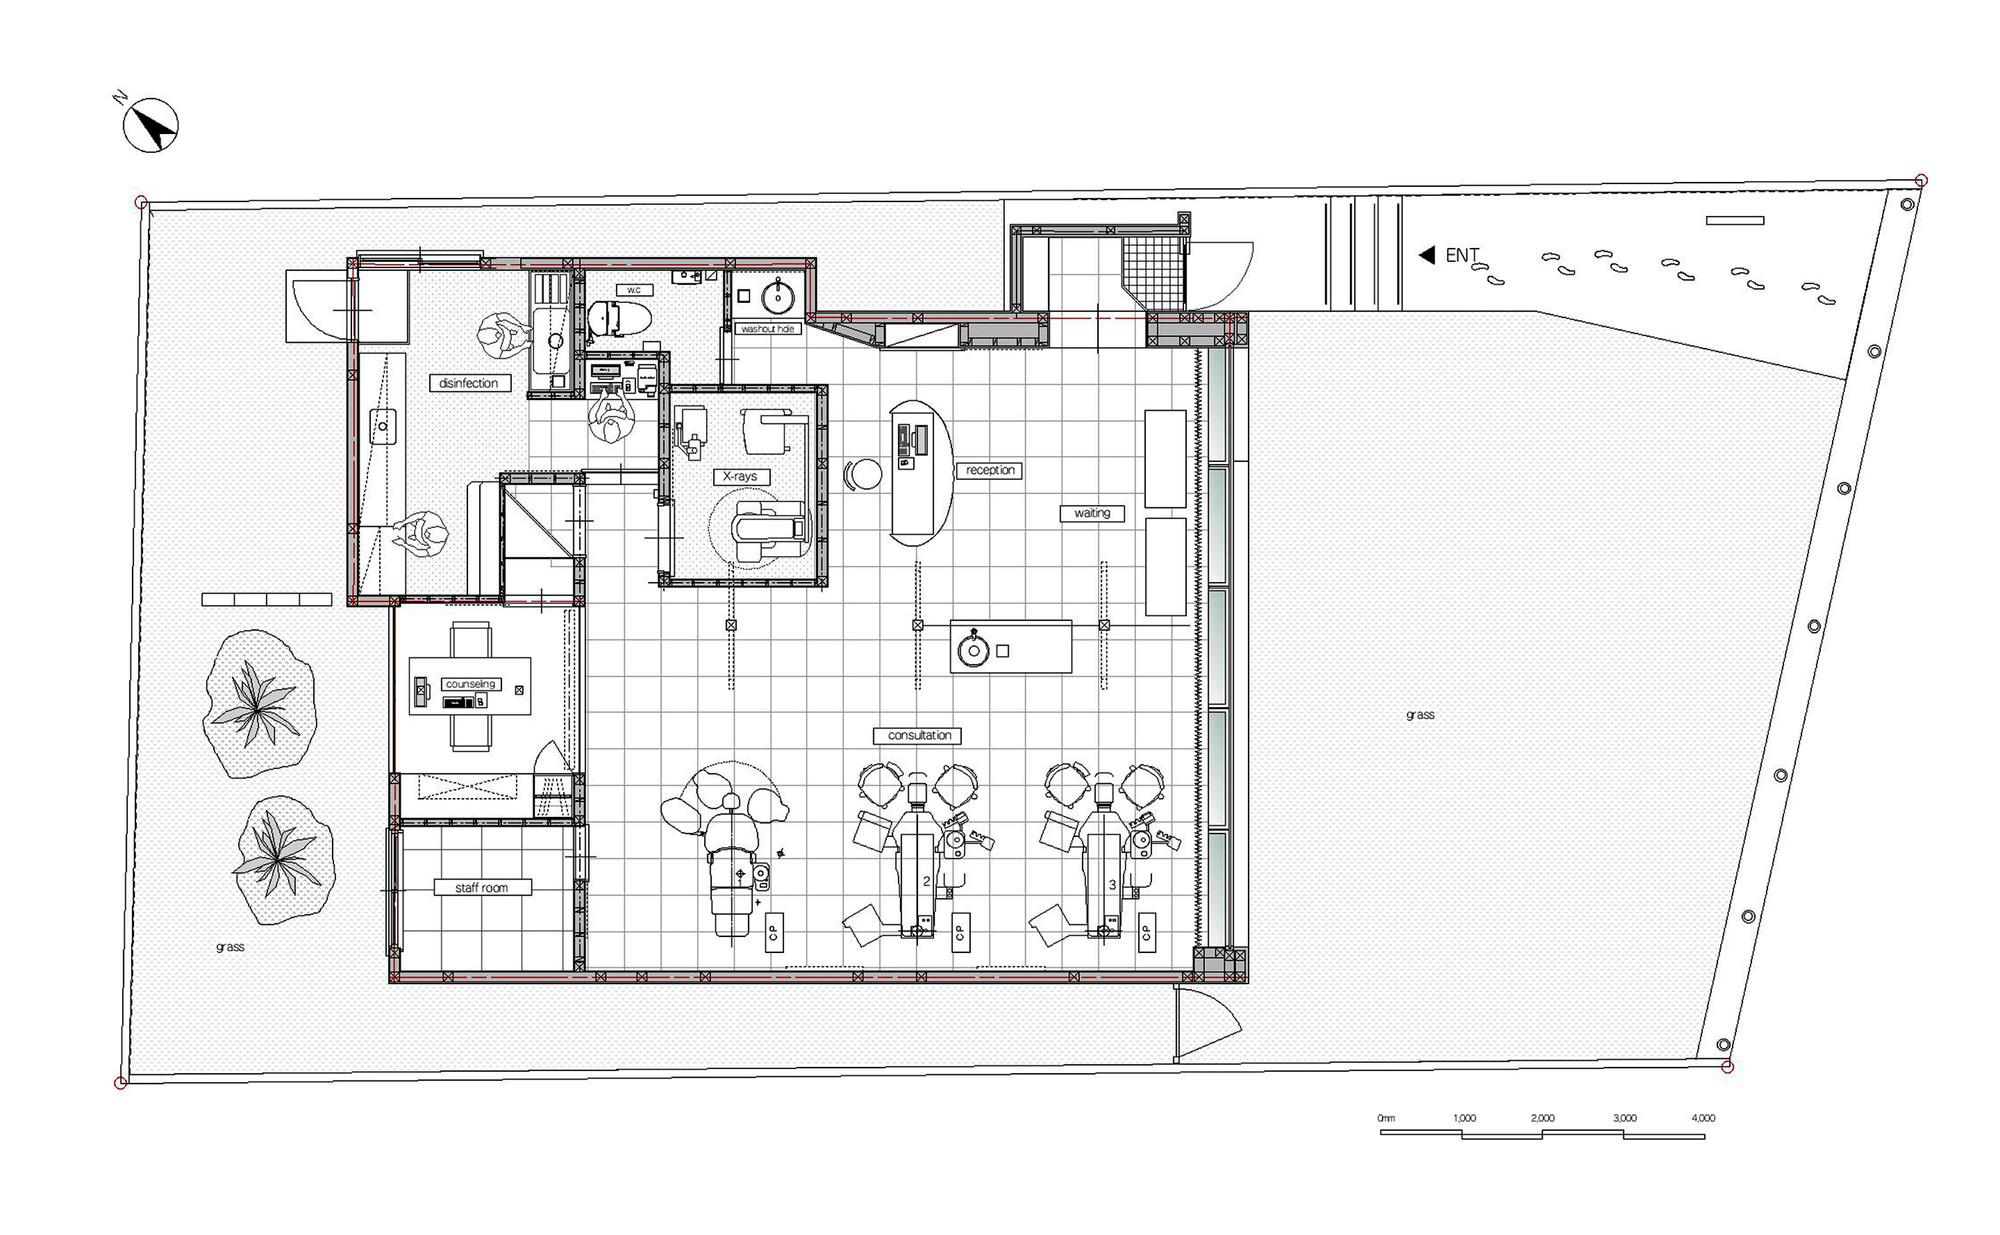 541398cfc07a8016d1000046 on Clinic Design Floor Plan